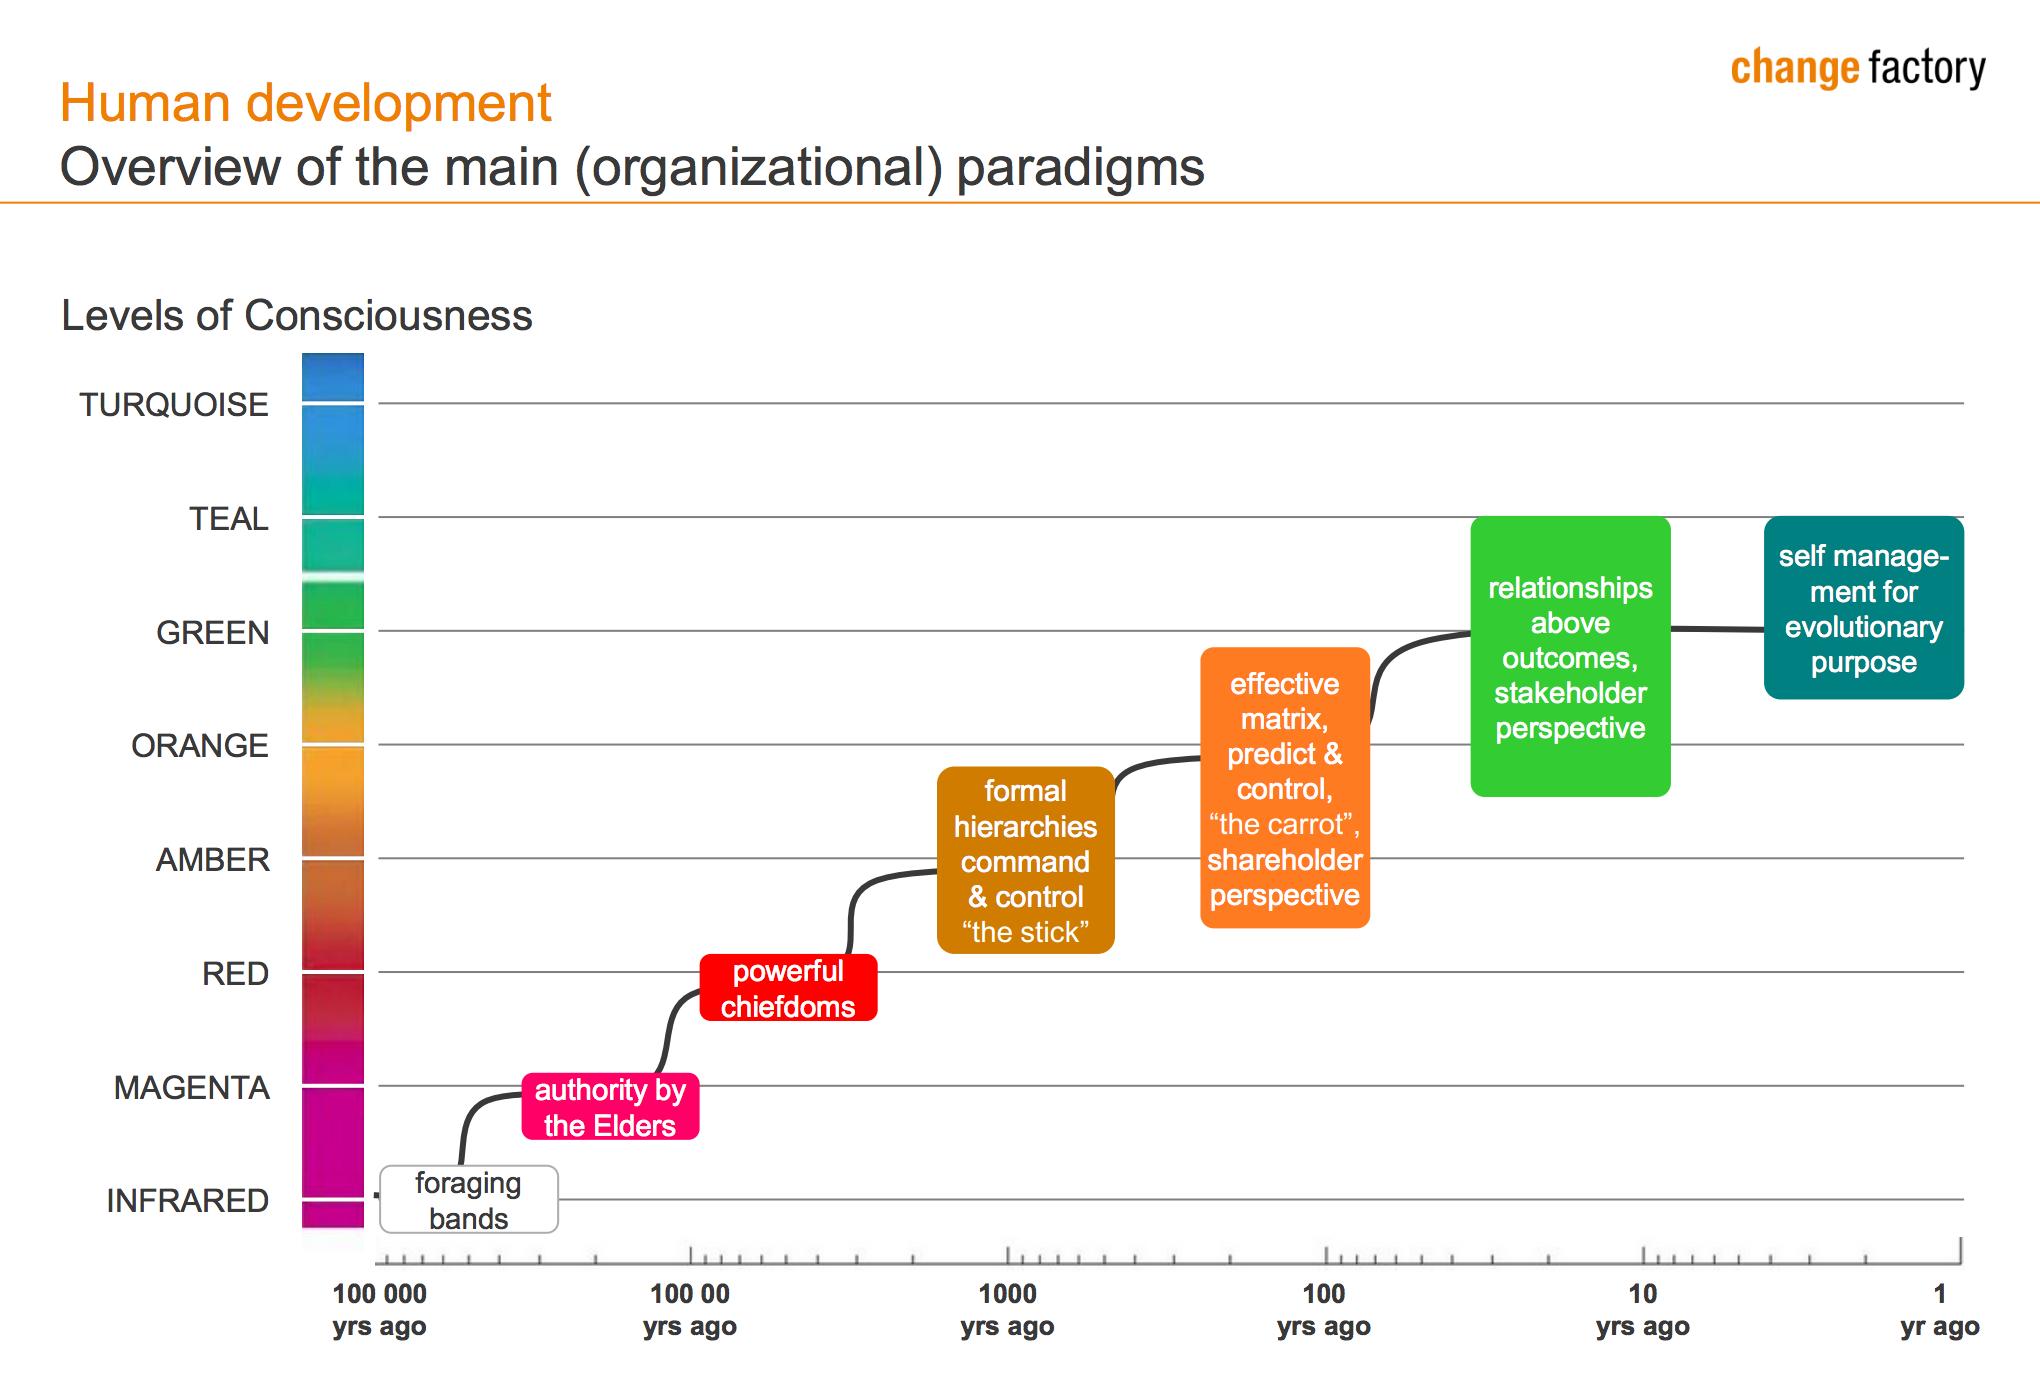 https://blogs.itmedia.co.jp/honjo/Human-Development-Reinventing-Organizations-chart-800x539.png%20%281%29.png